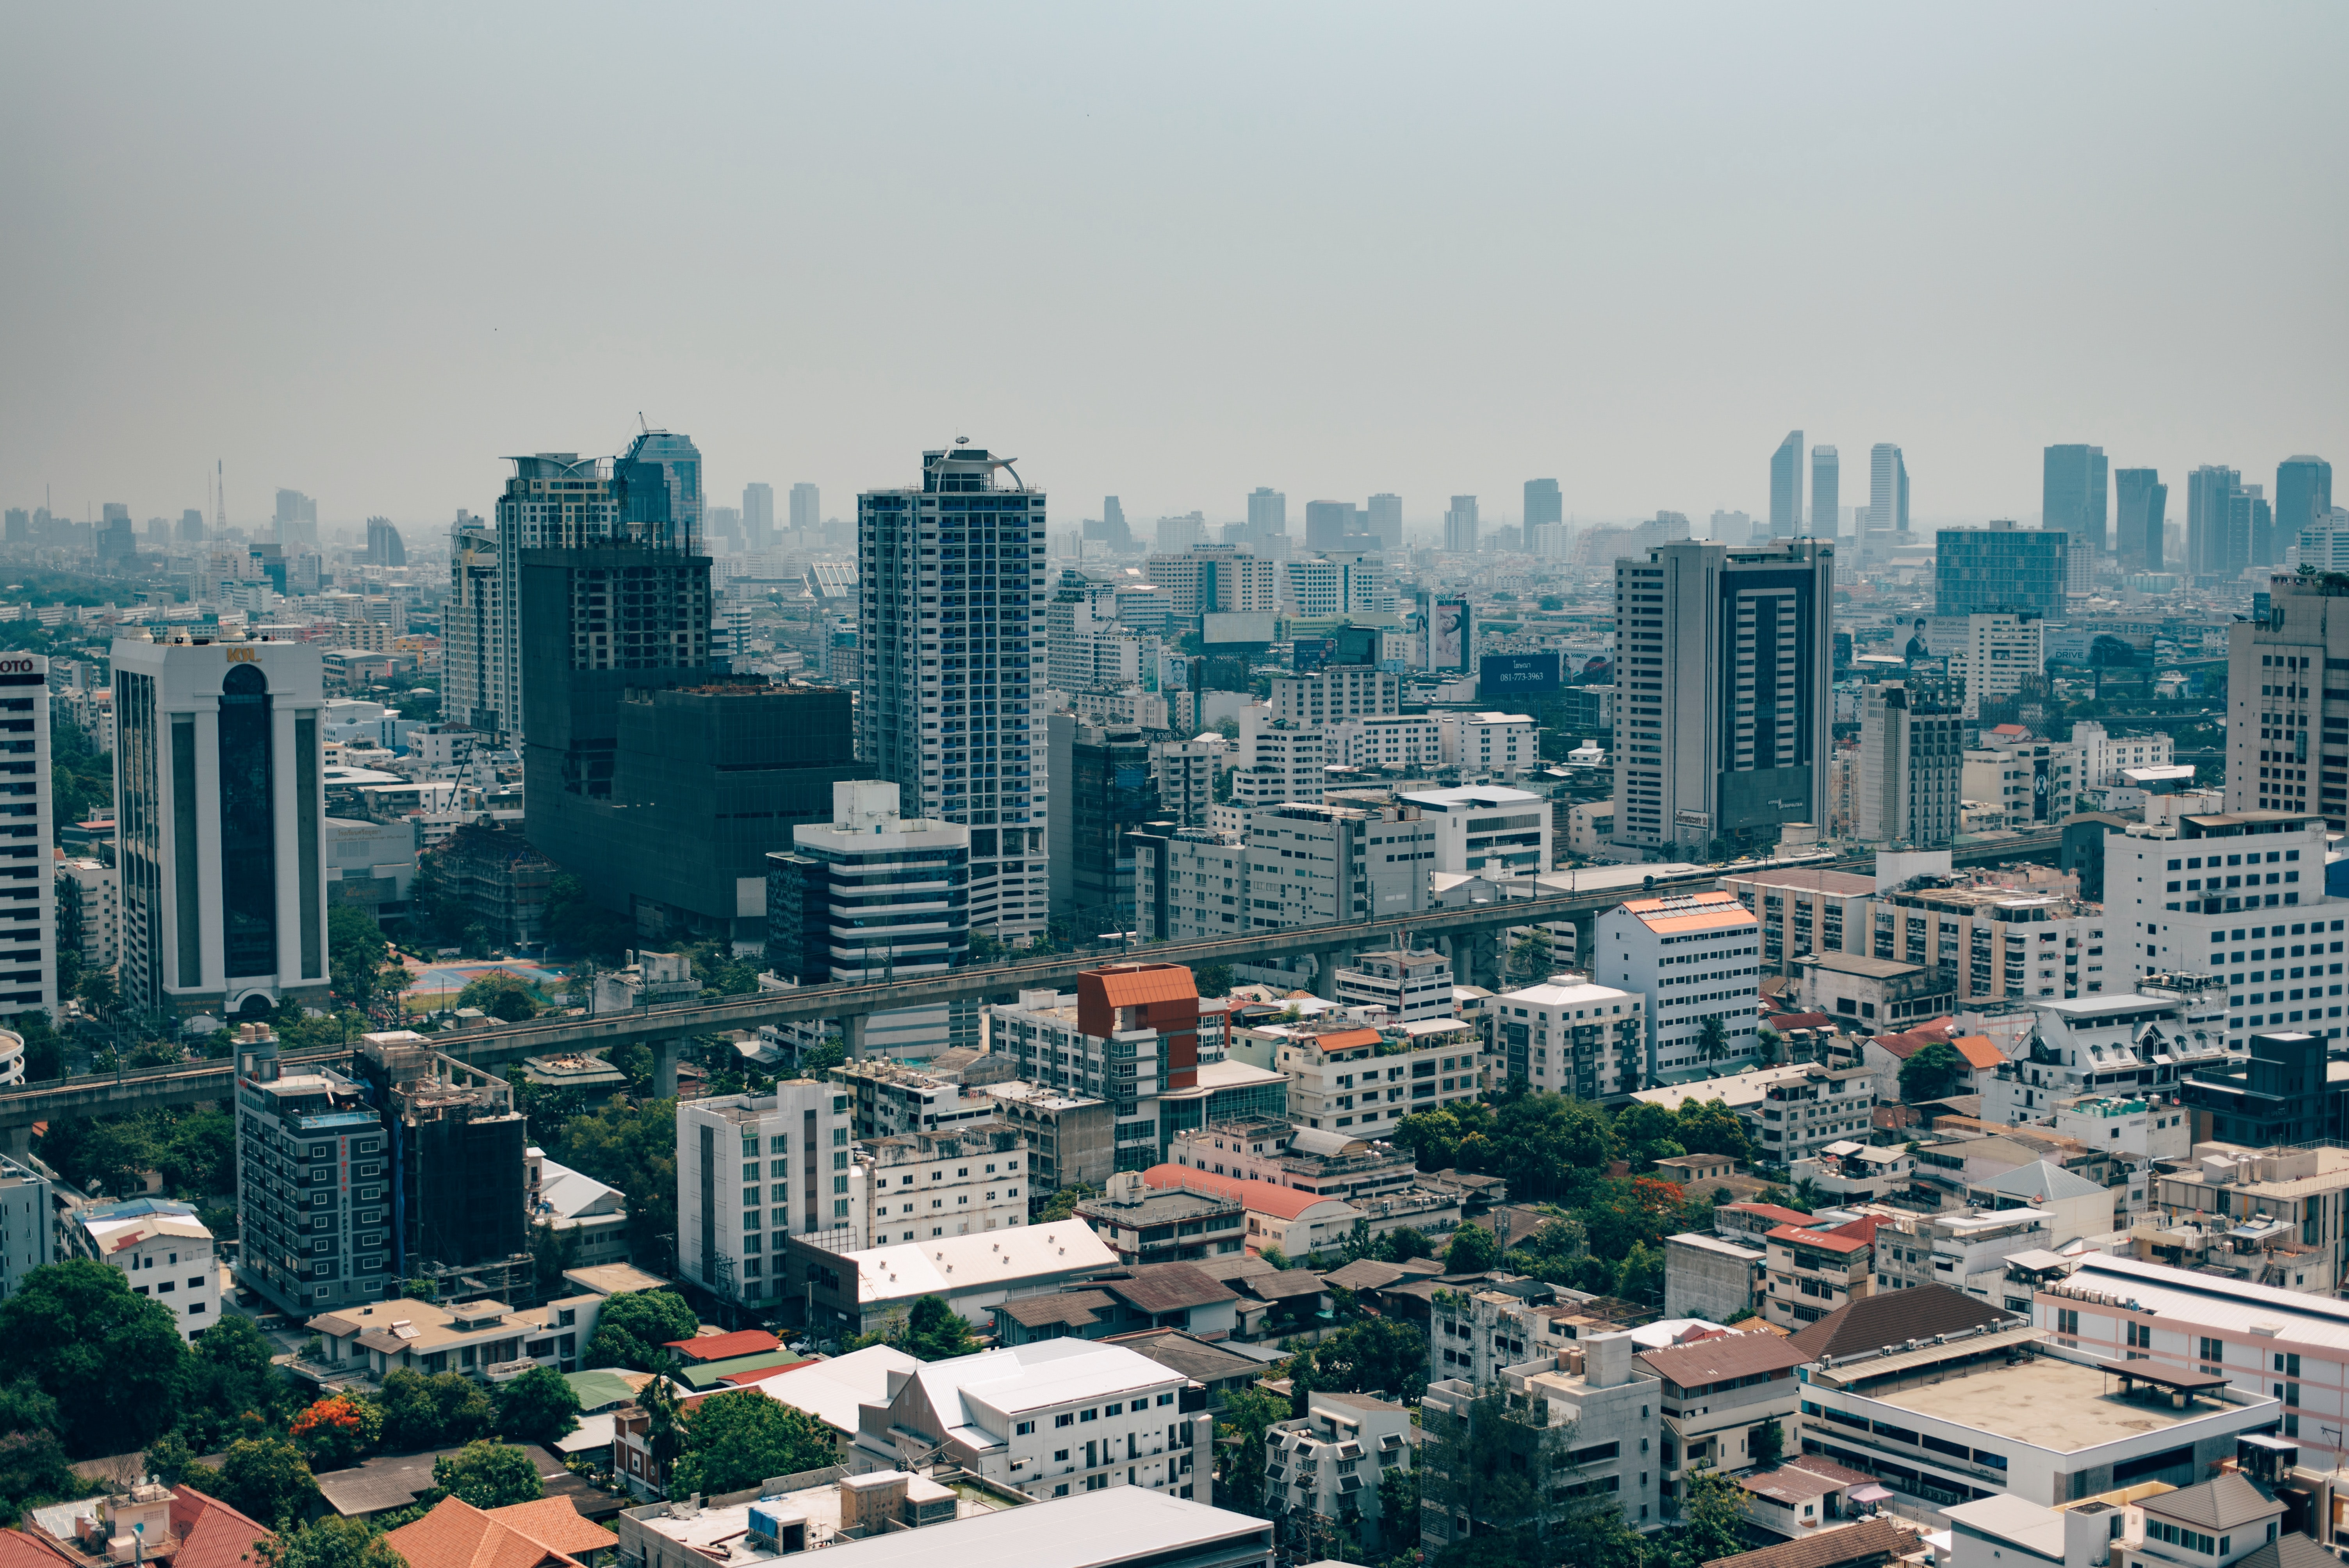 Amidst economic plunge, Thai Christians distributing aid and Scripture